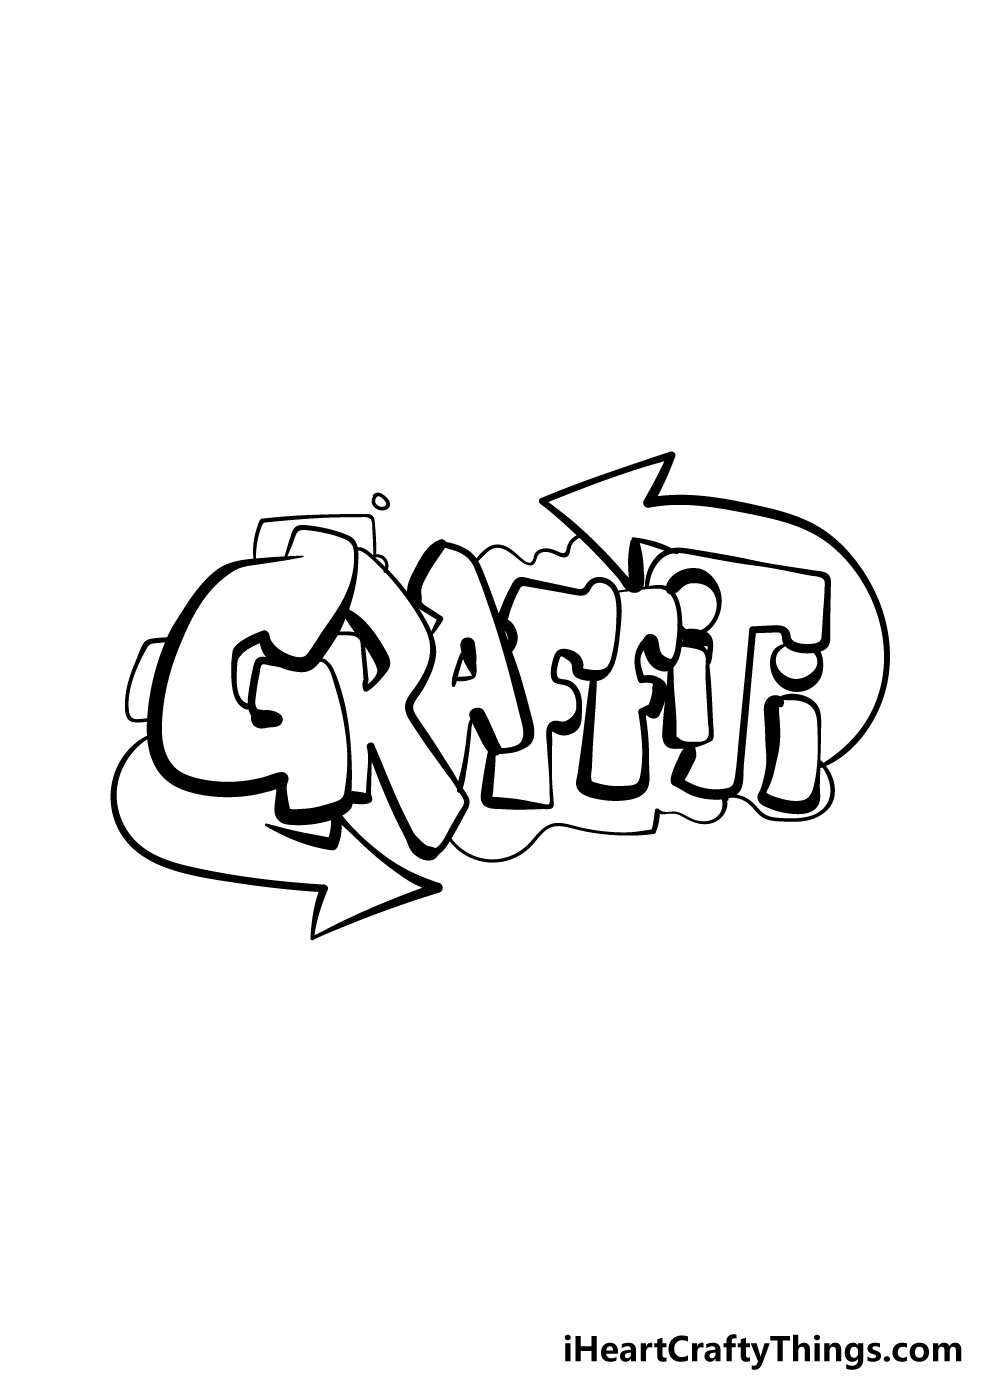 graffiti drawing step 10